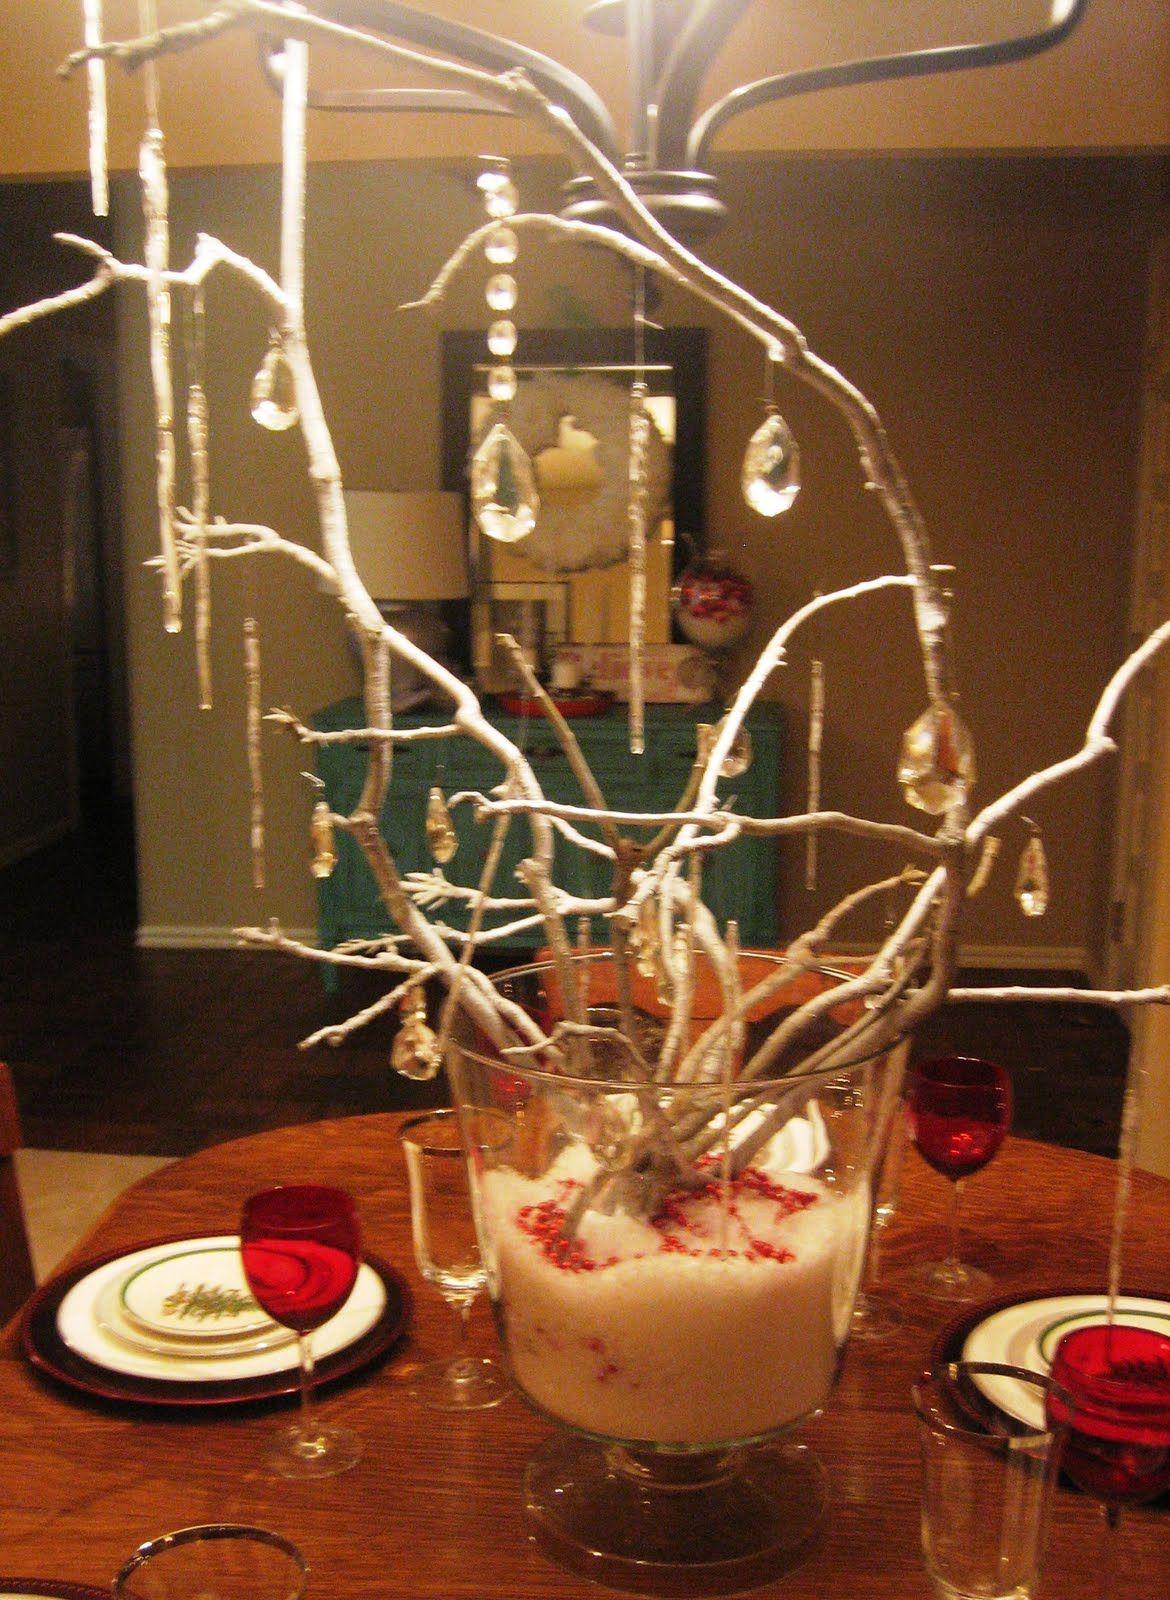 Xmas Centerpieces Beautiful Easy Christmas Centerpieces Ideas  Easy Christmas